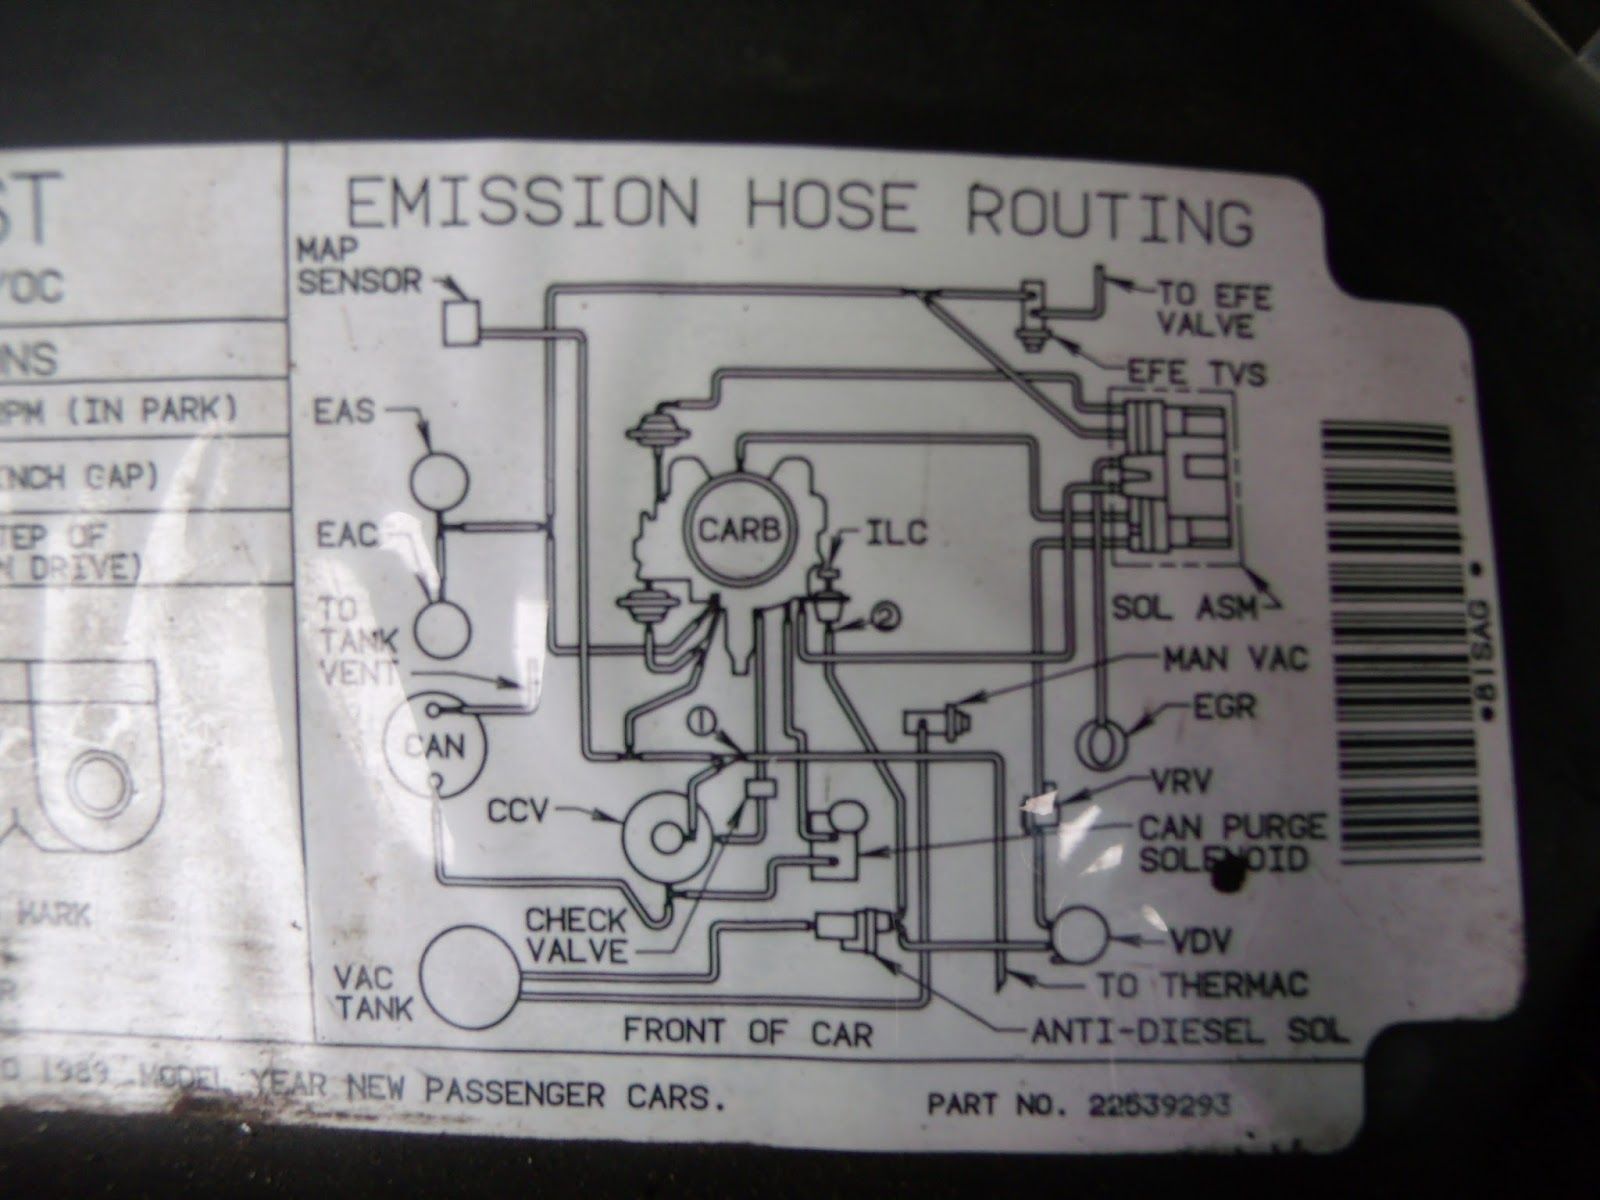 1989 307 olds ccc vacuum diagram map station wagon forums vacuum diagram for 1989 buick lesabre [ 1600 x 1200 Pixel ]